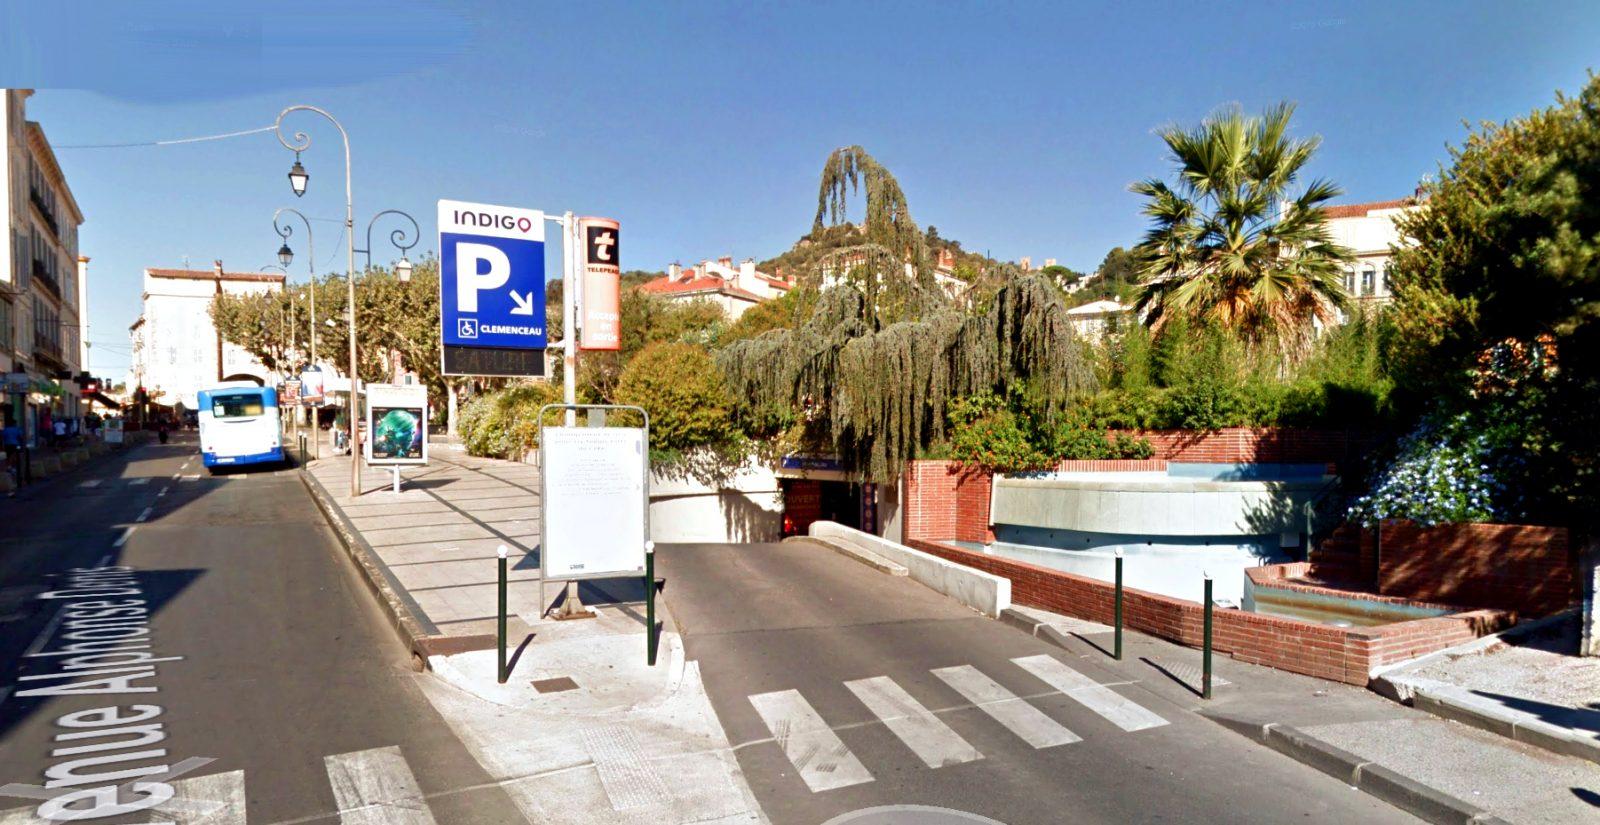 parking indigo clemenceau